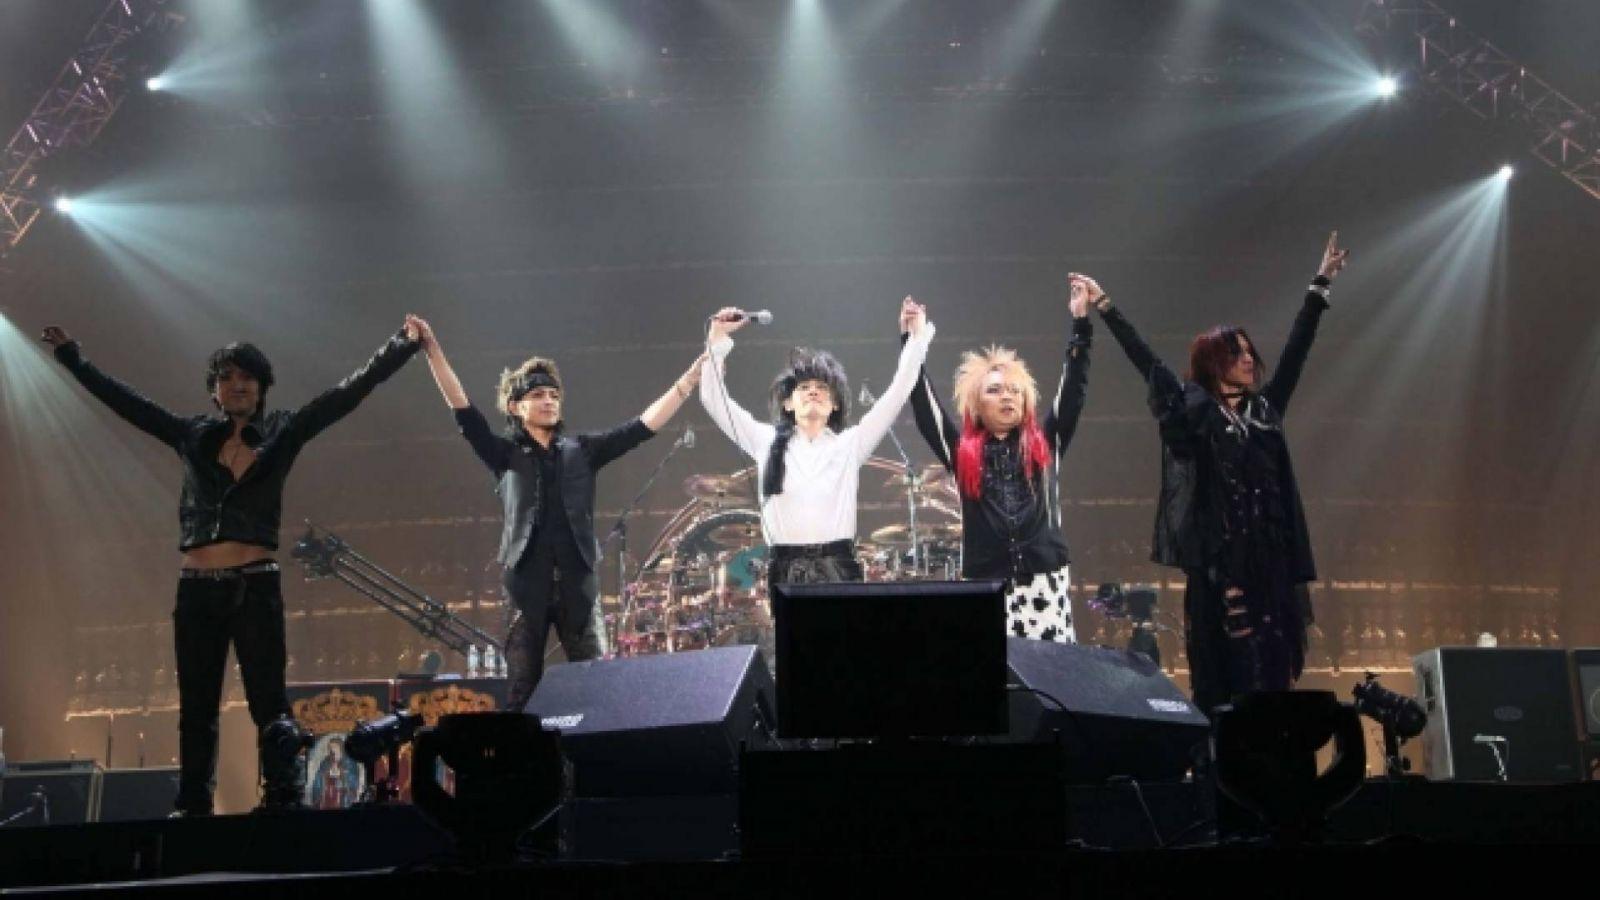 LUNA SEA Lunacy: Kurofuku Gentei GIG ~the Holy Night~ at Tokyo Dome © LUNA SEA Inc.